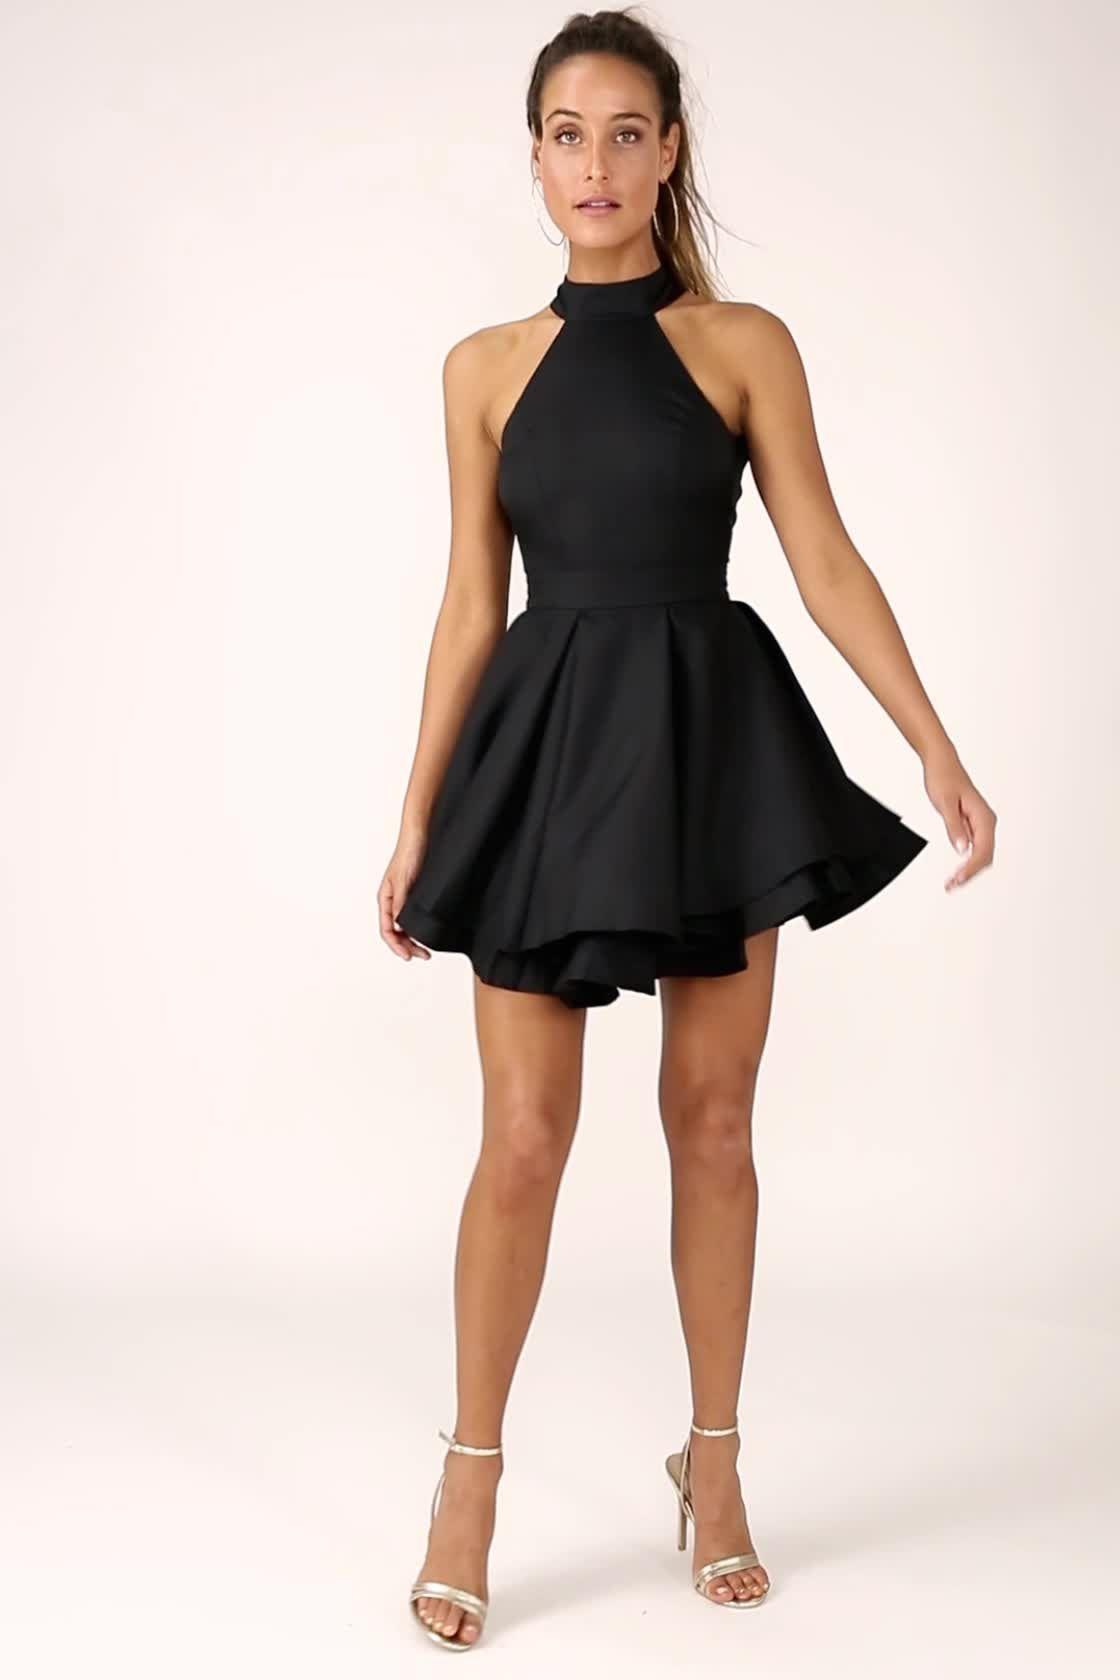 691850c744 Cute Black Skater Dress - LBD - Homecoming Dress